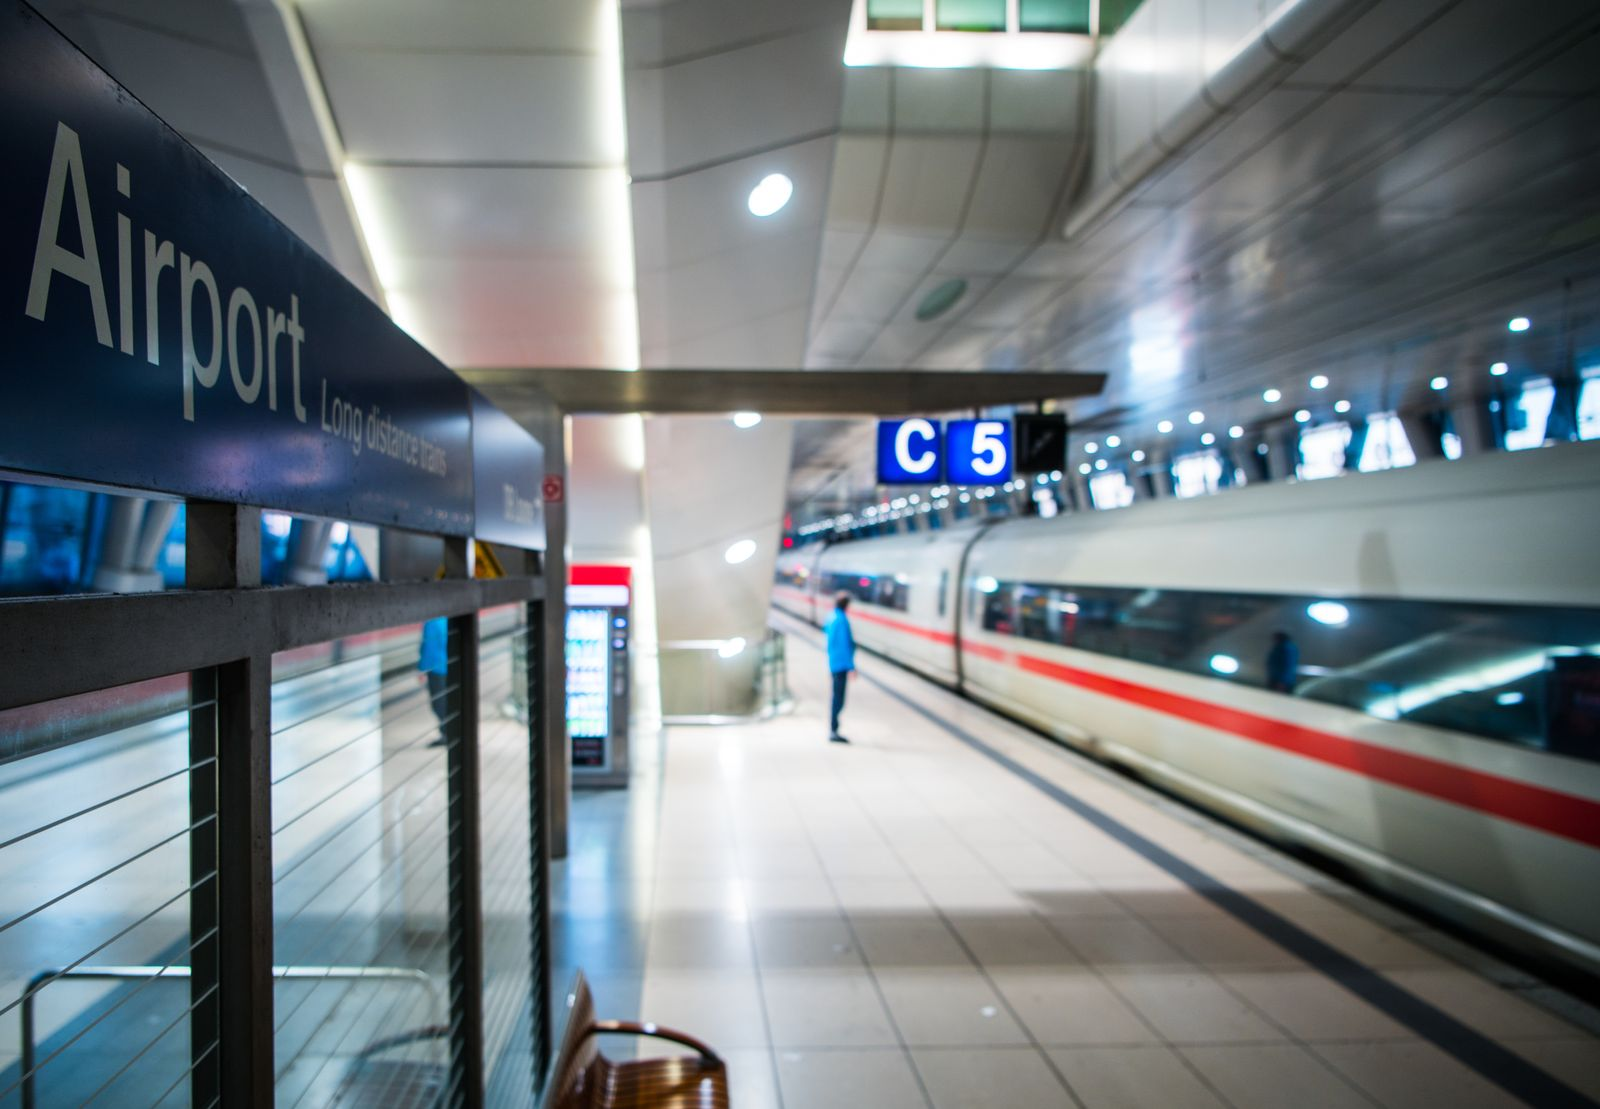 Bahnhof / Frankfurt Main Flughafen / Symbol